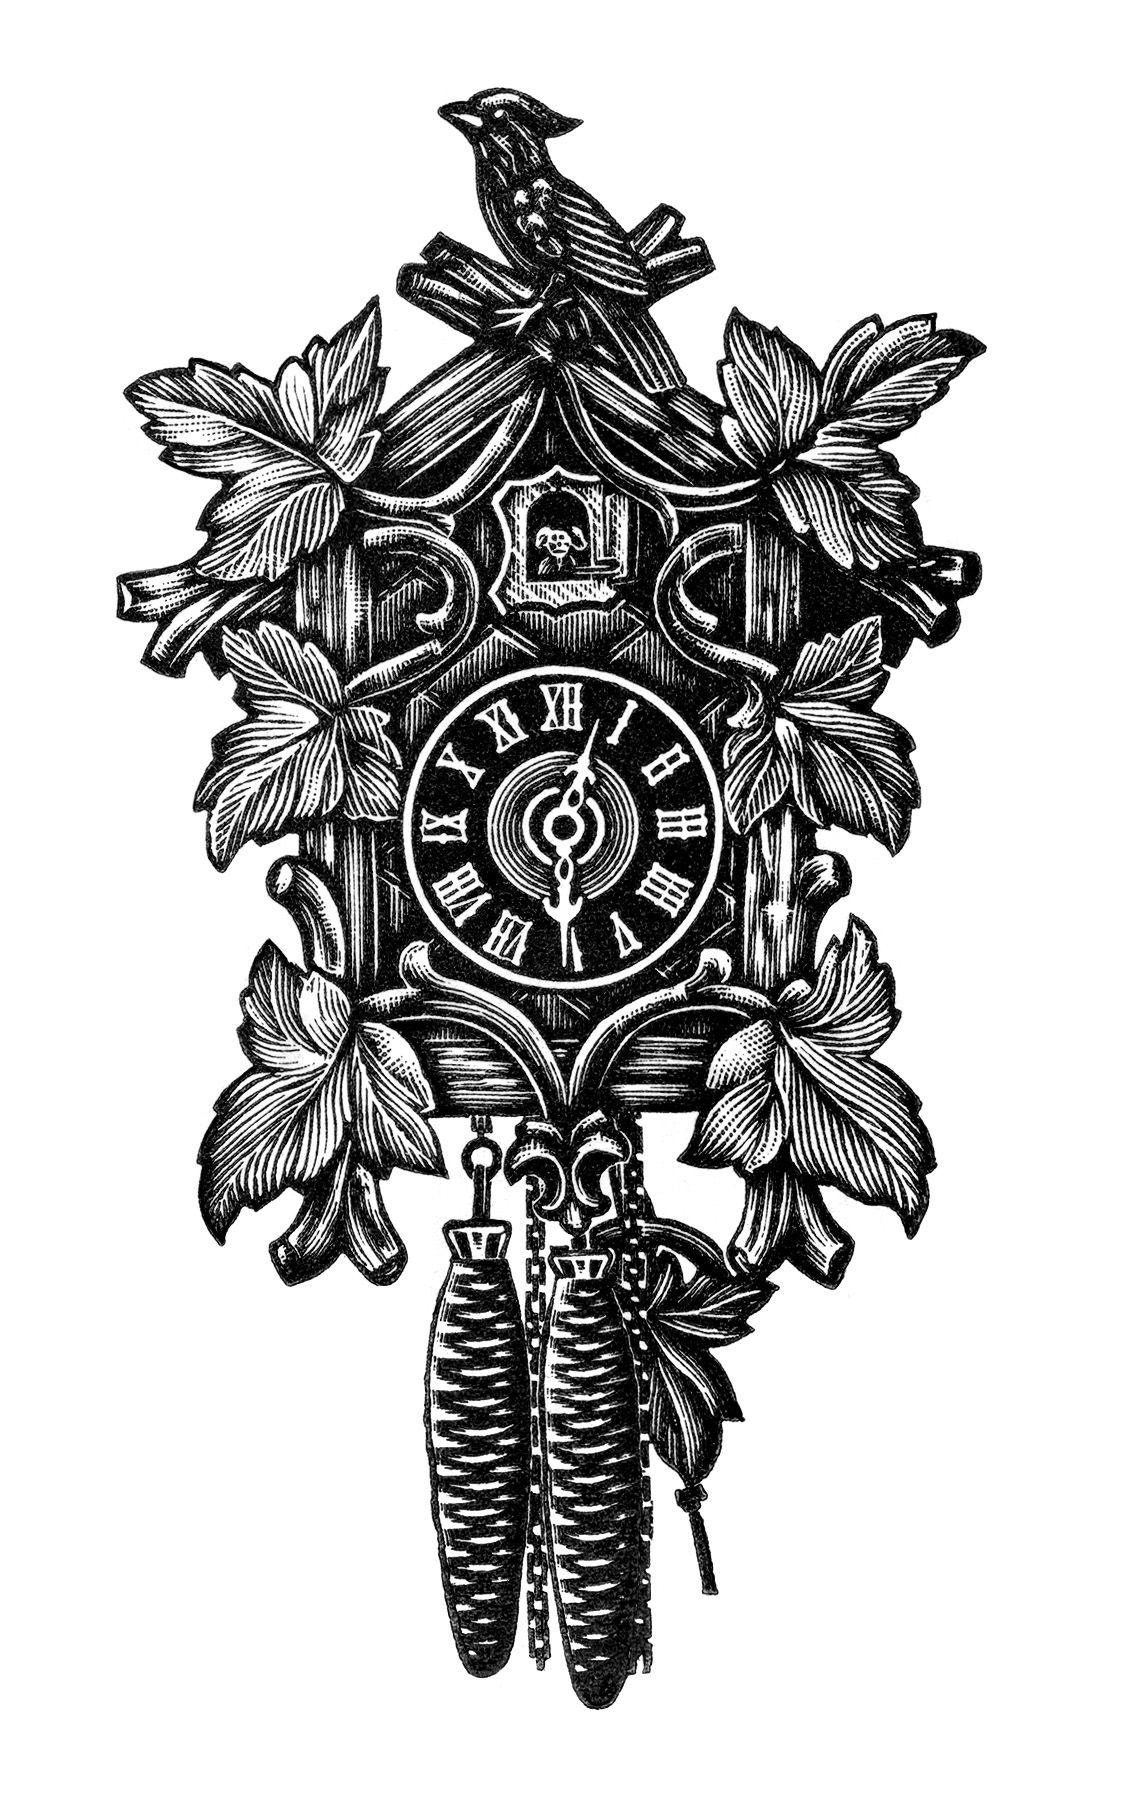 vintage clock clip art, black and white clipart, cuckoo clock image.